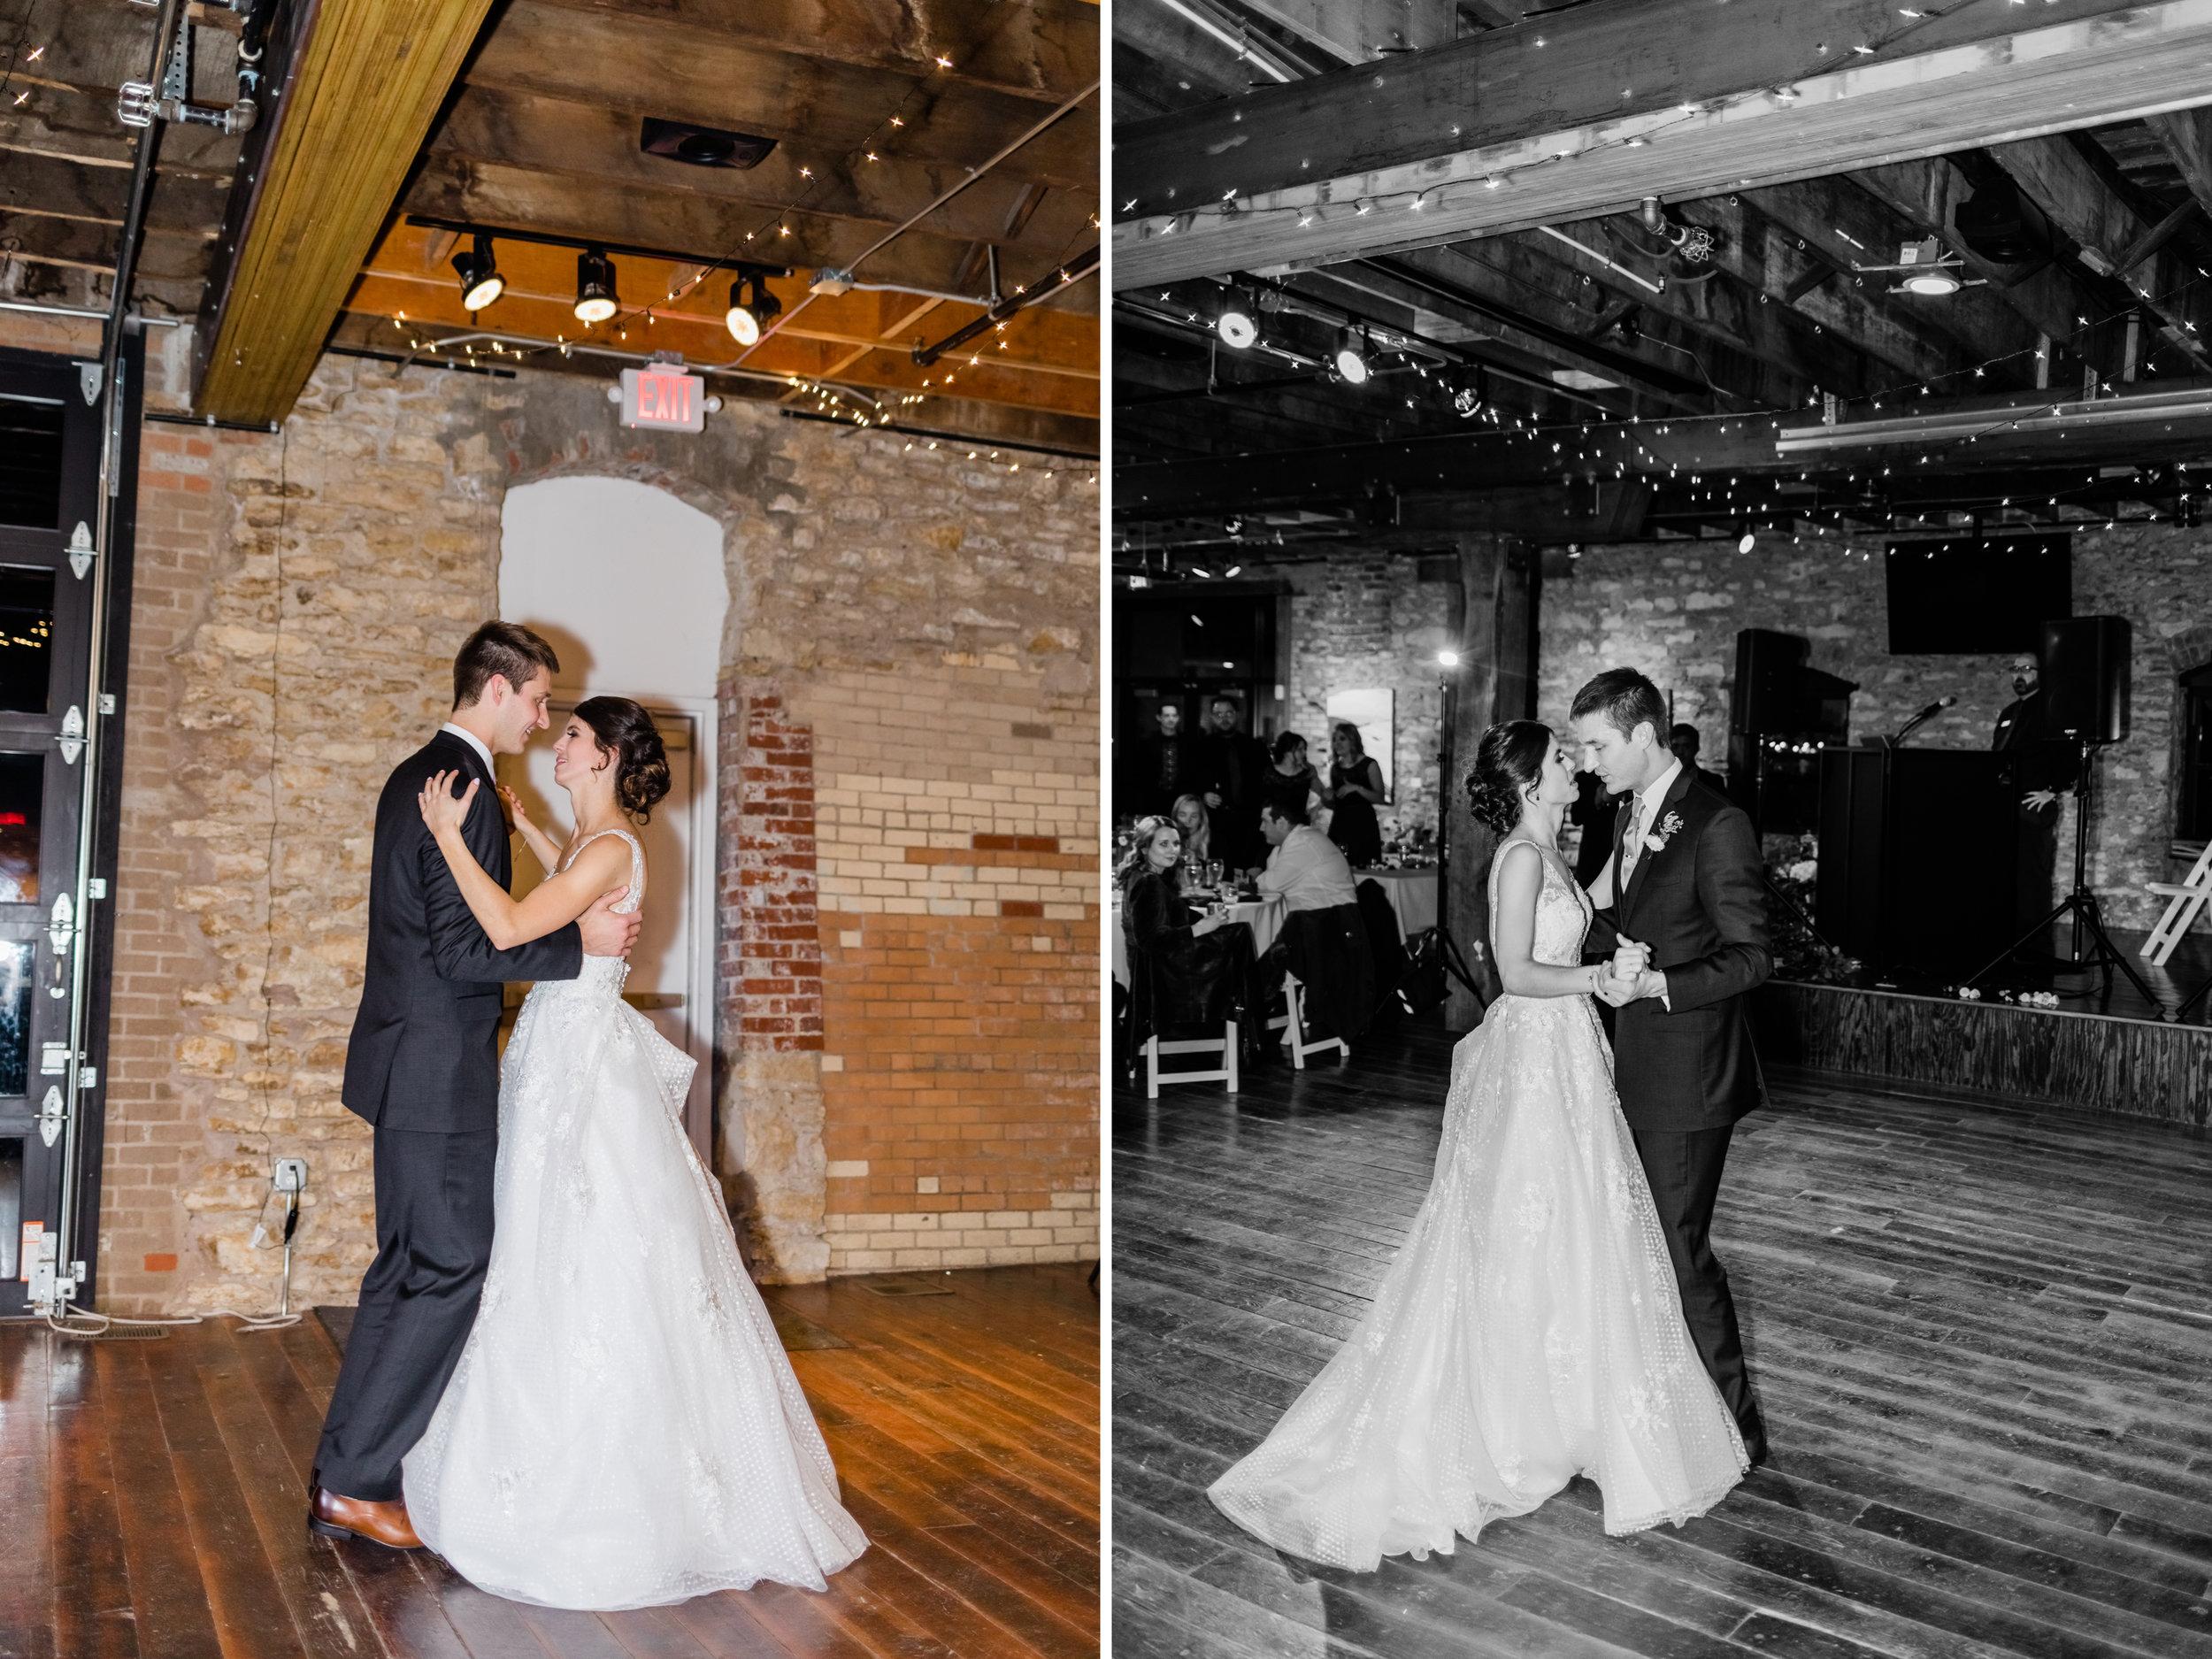 Lawrence Kansas Wedding Cider Gallery 1.jpg